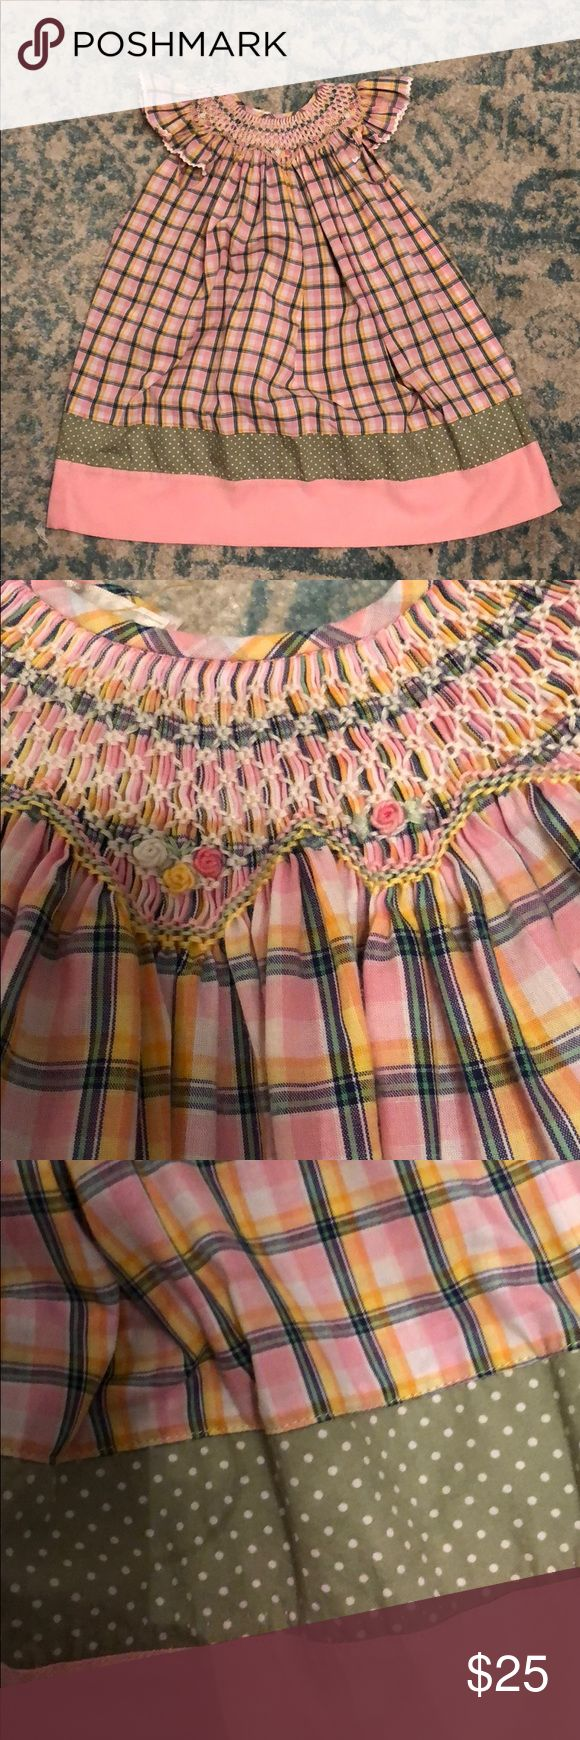 Girls smocked dress size 2T Rosalina 2T smocked dress. Green, pink, white, and yellow. rosalina Dresses Formal